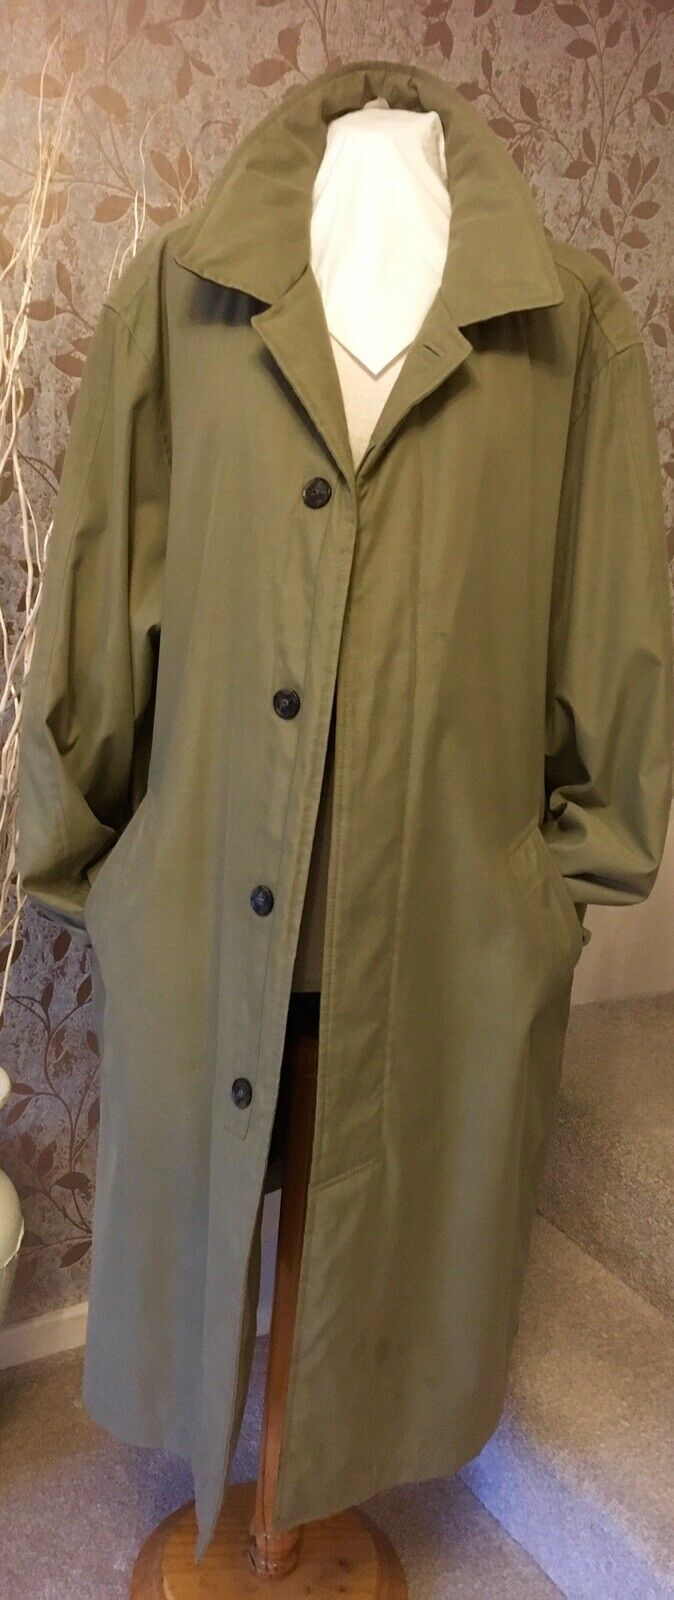 "Zona Gentlemen's Gentlemen's Gentlemen's Trench Coat 50"" Chest Olive Green 100% Polyester Rain Mac XL e5bf29"